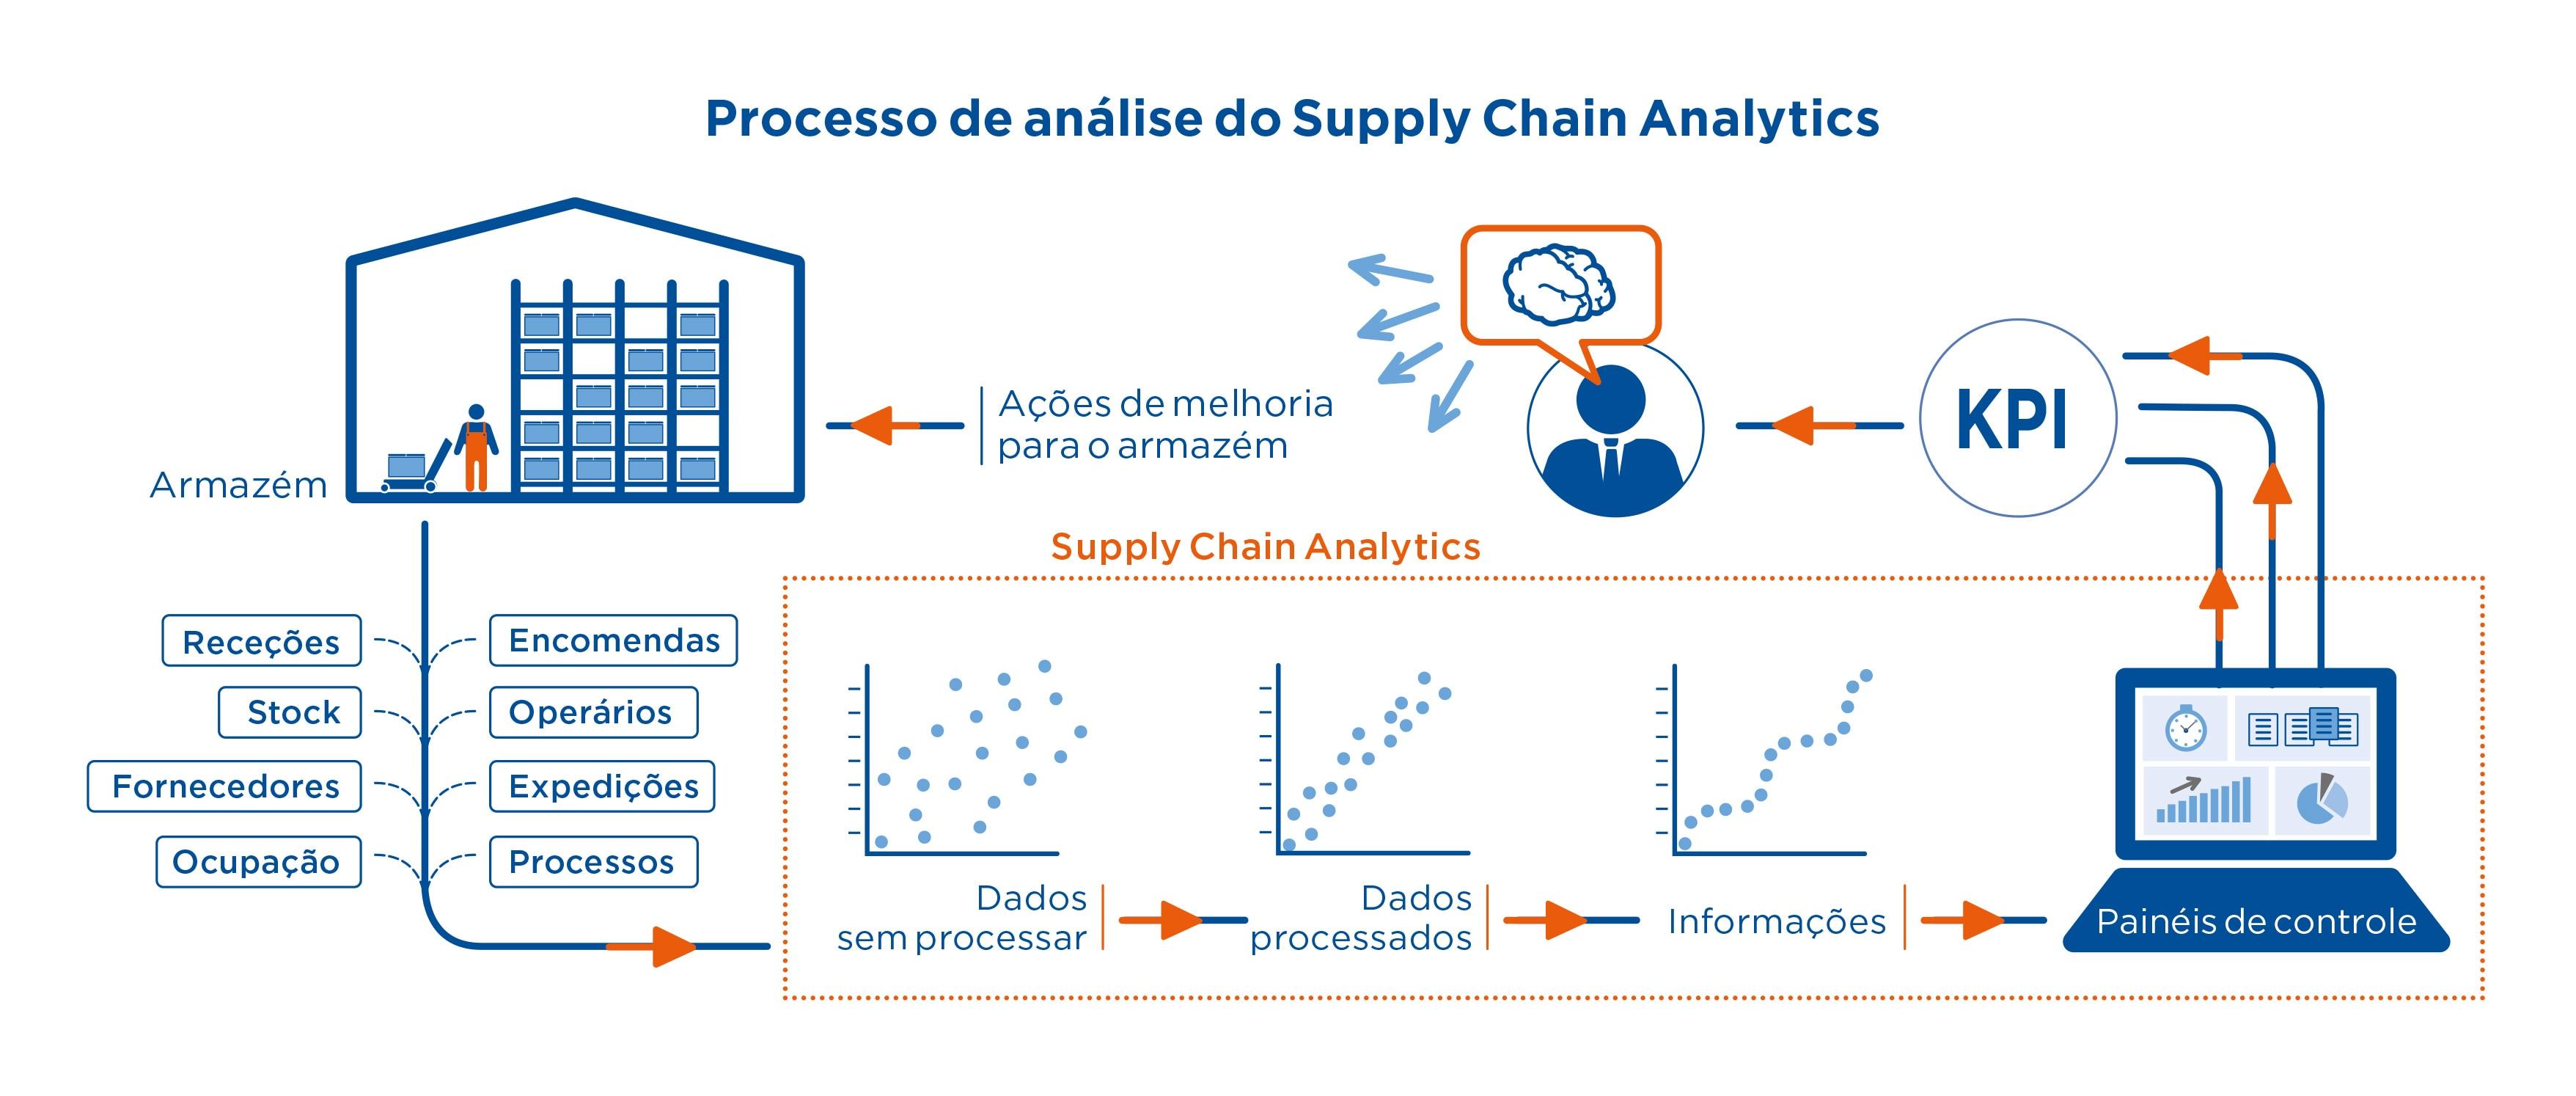 Processo de análise do Supply Chain Analytics